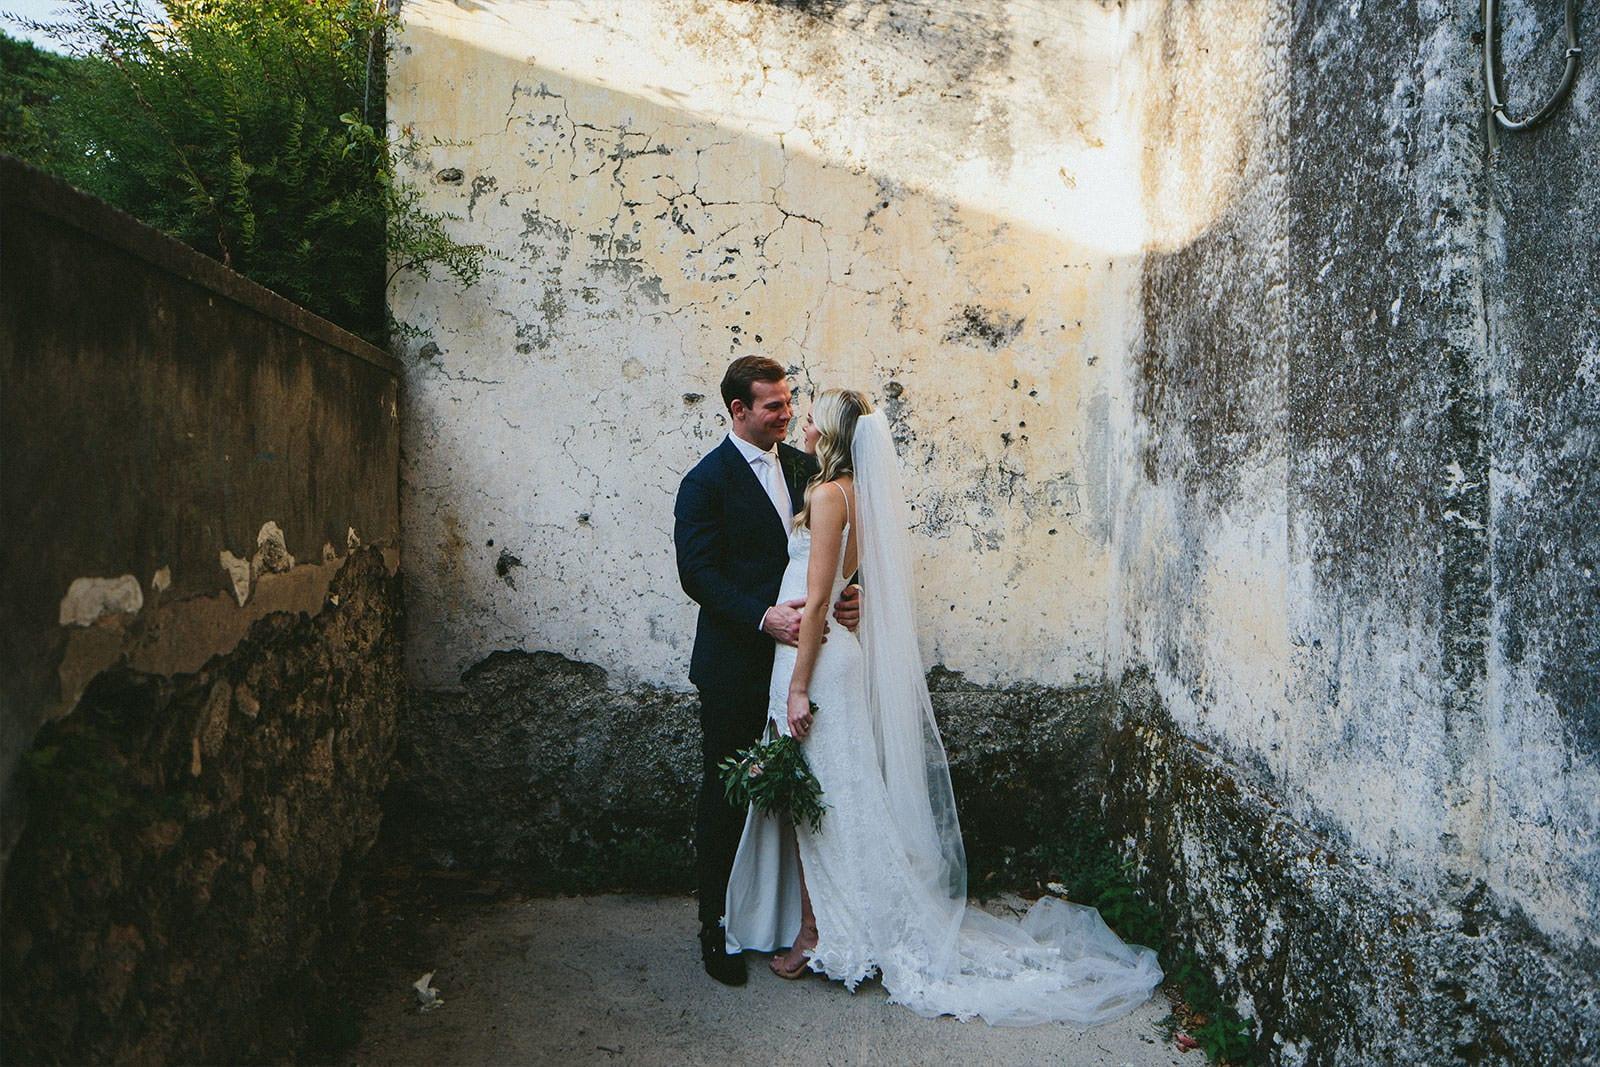 Blonde bride wearing Grace Loves Lace Lottie Gown being held by groom